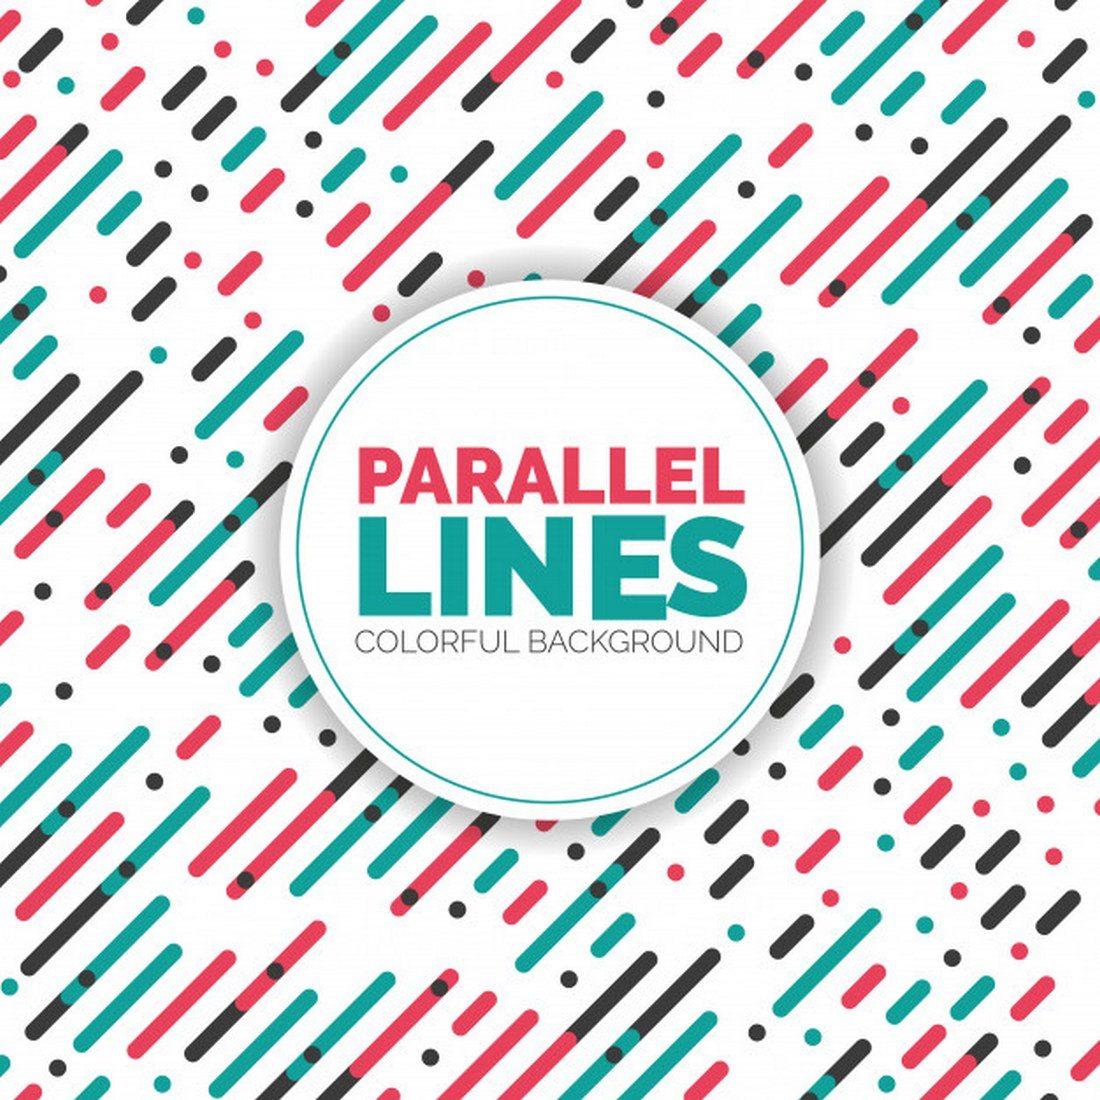 30+ Best Line Patterns & Textures 3